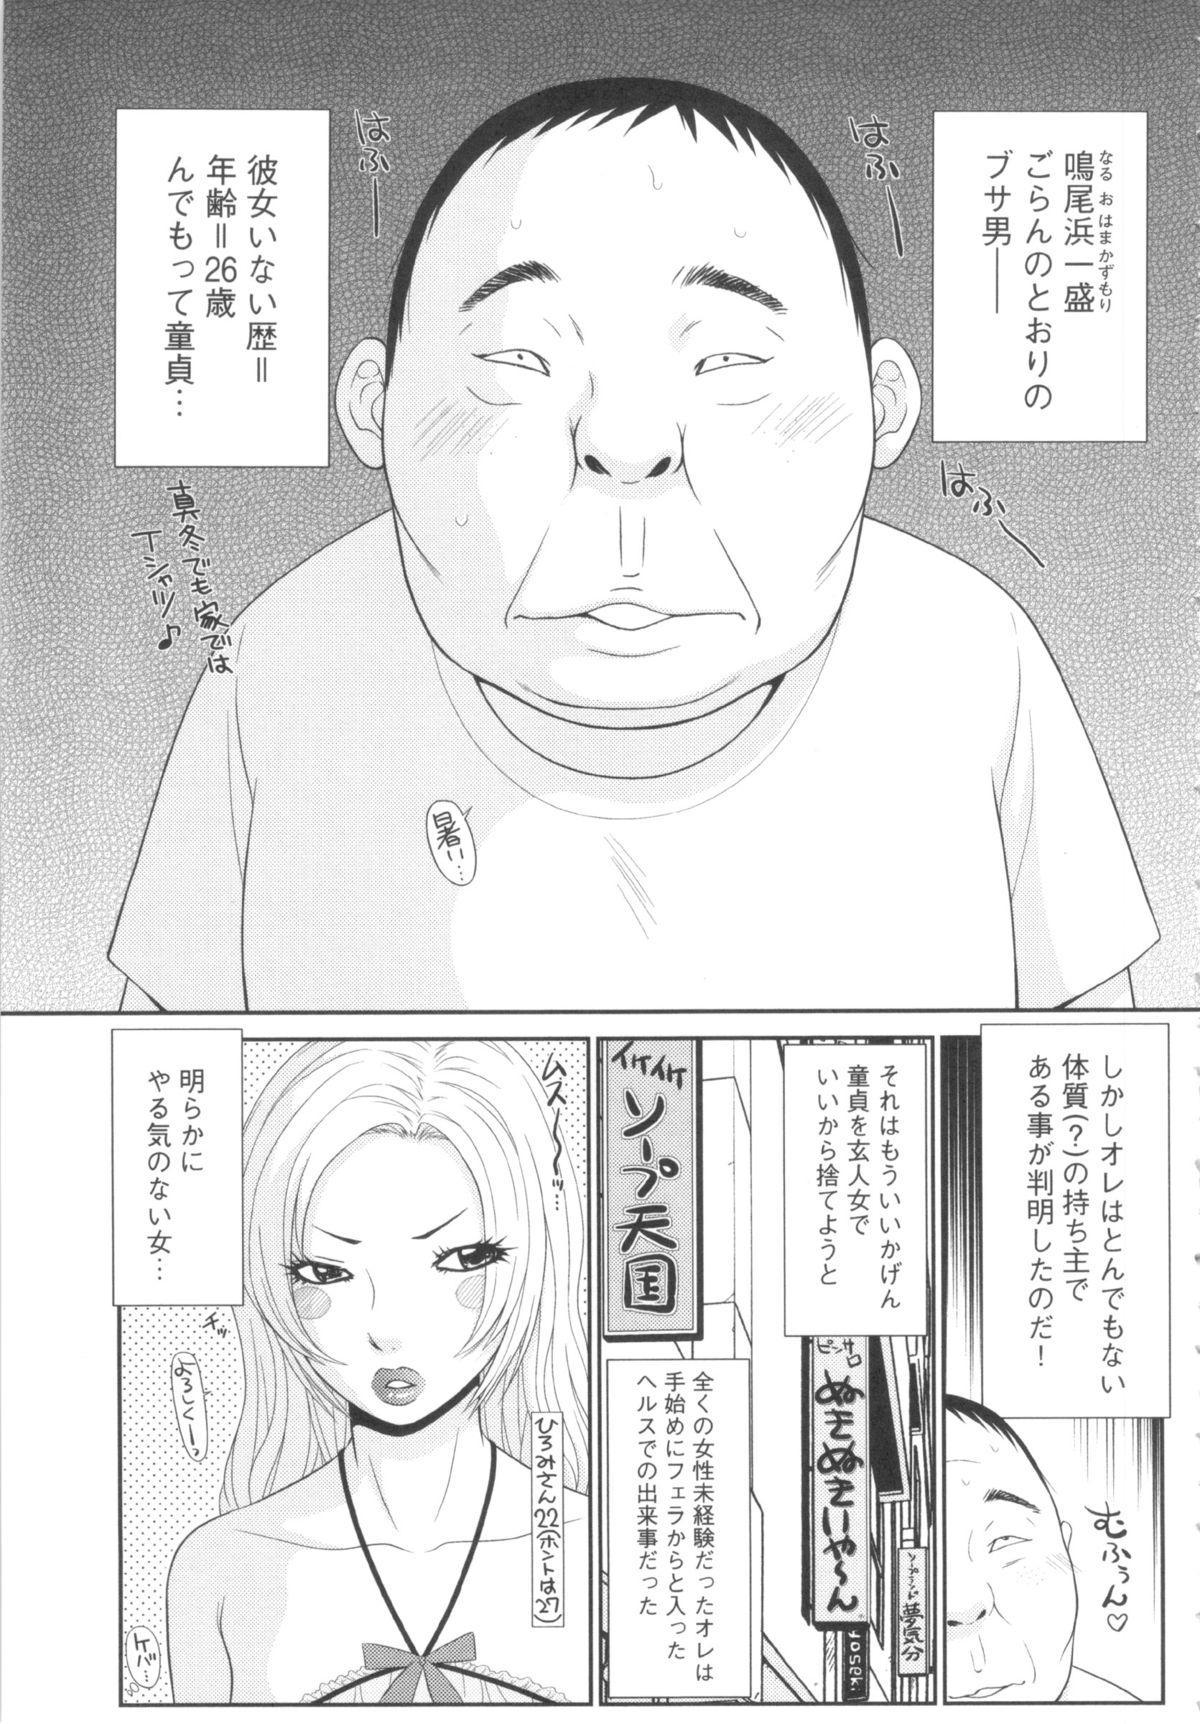 Kiseki No Zaajiru - Sperm of Miracle 7